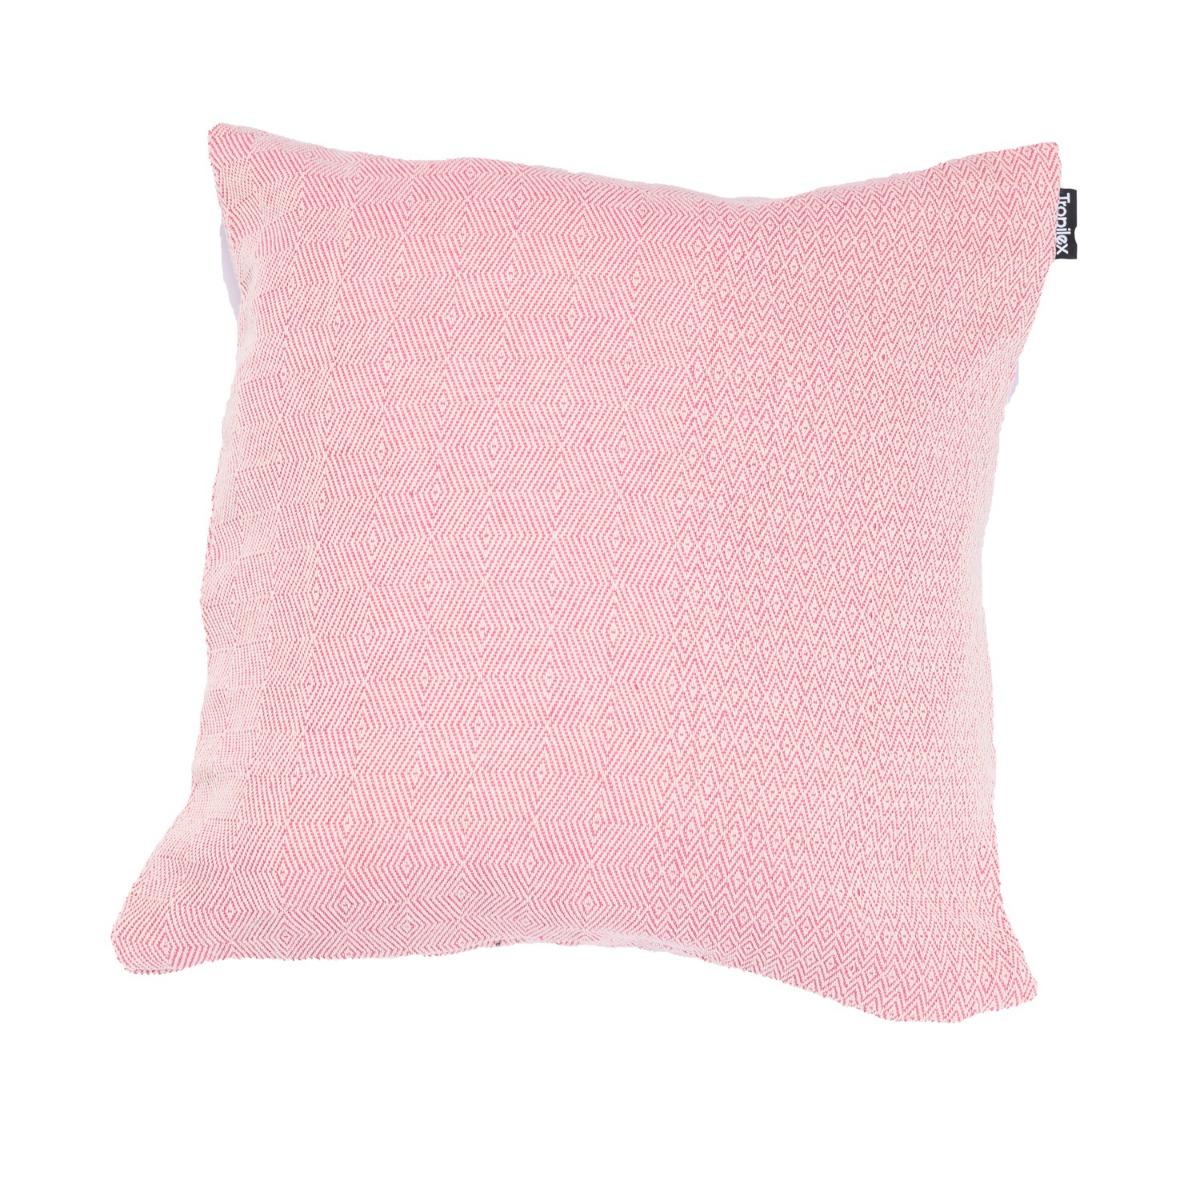 'Natural' Pink Kussentje - Roze - Tropilex �